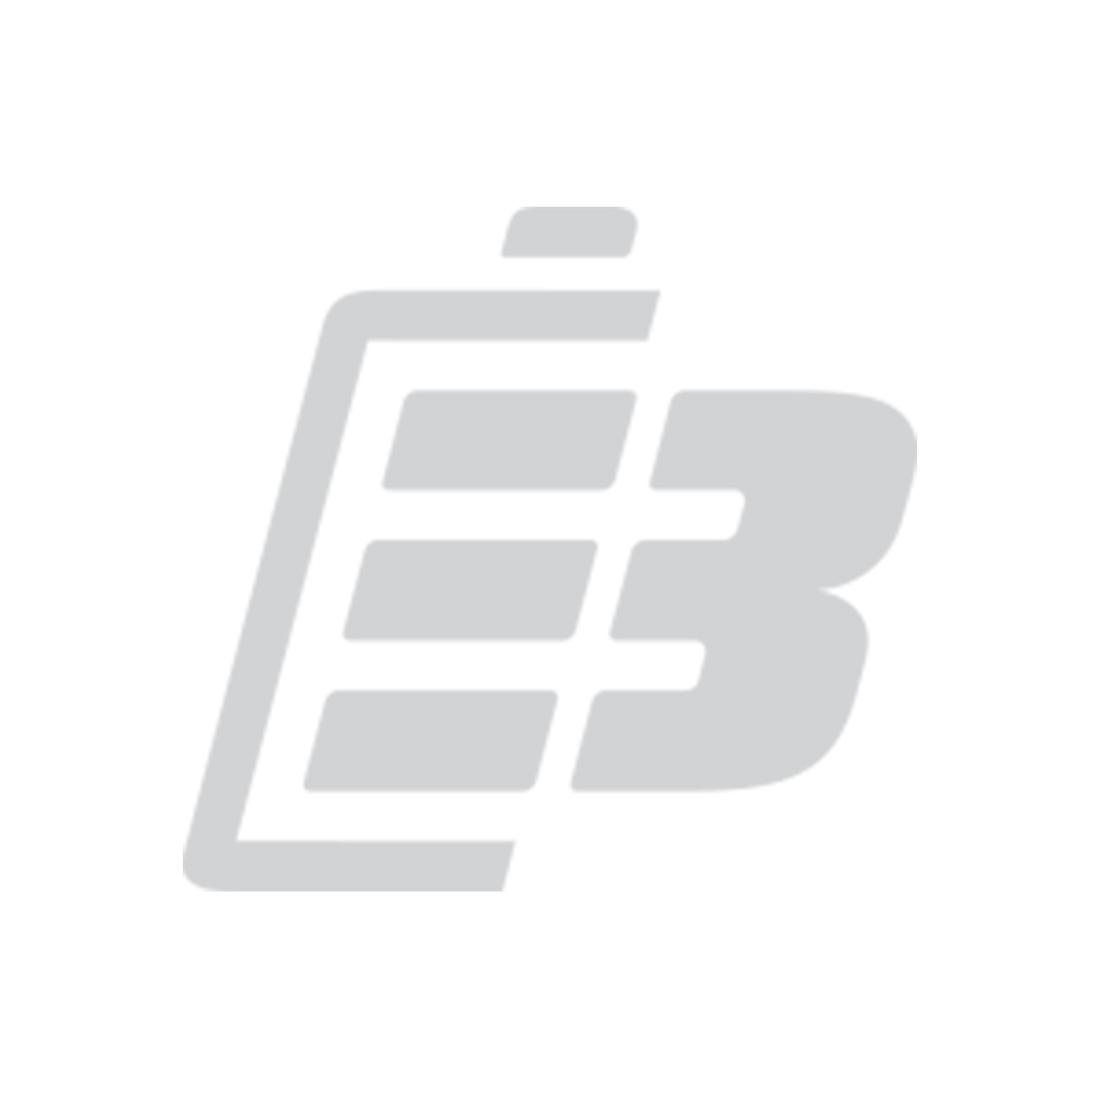 Crane remote control battery Cattron Theimeg Easy u. Mini_1